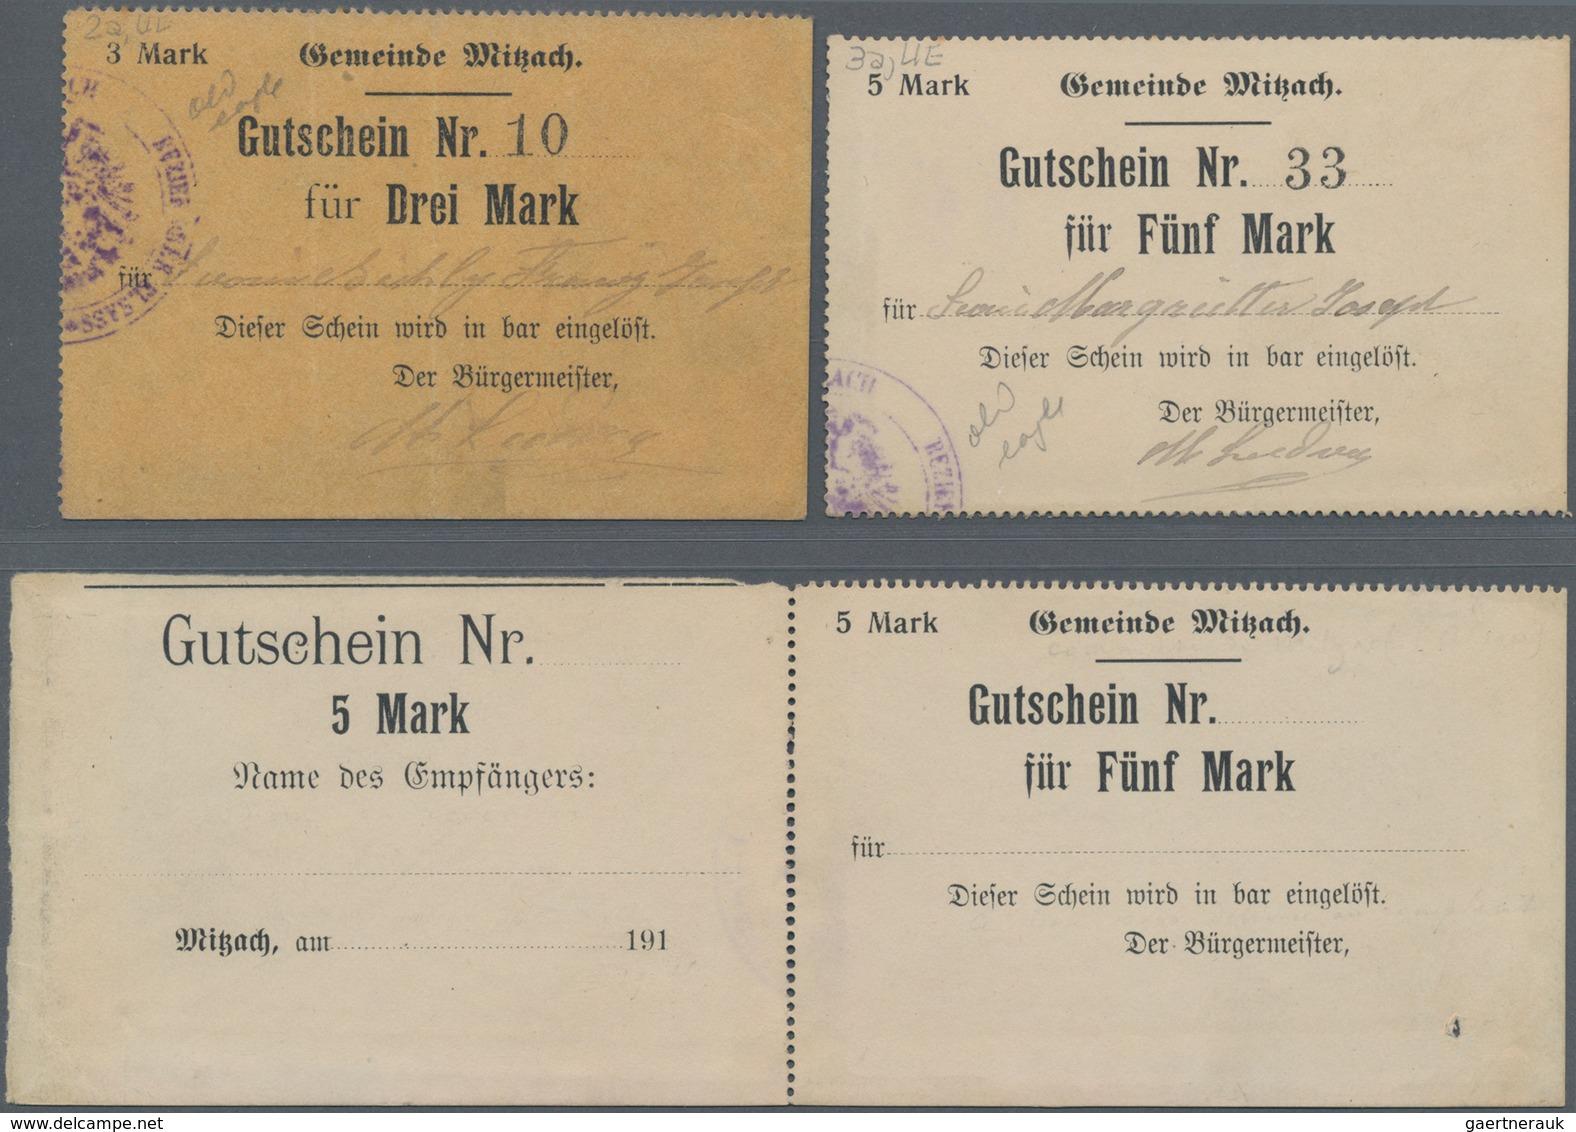 Deutschland - Notgeld - Elsass-Lothringen: Mitzach, Oberelsass, Gemeinde, 3, 5 Mark, O. D., Papier, - Allemagne